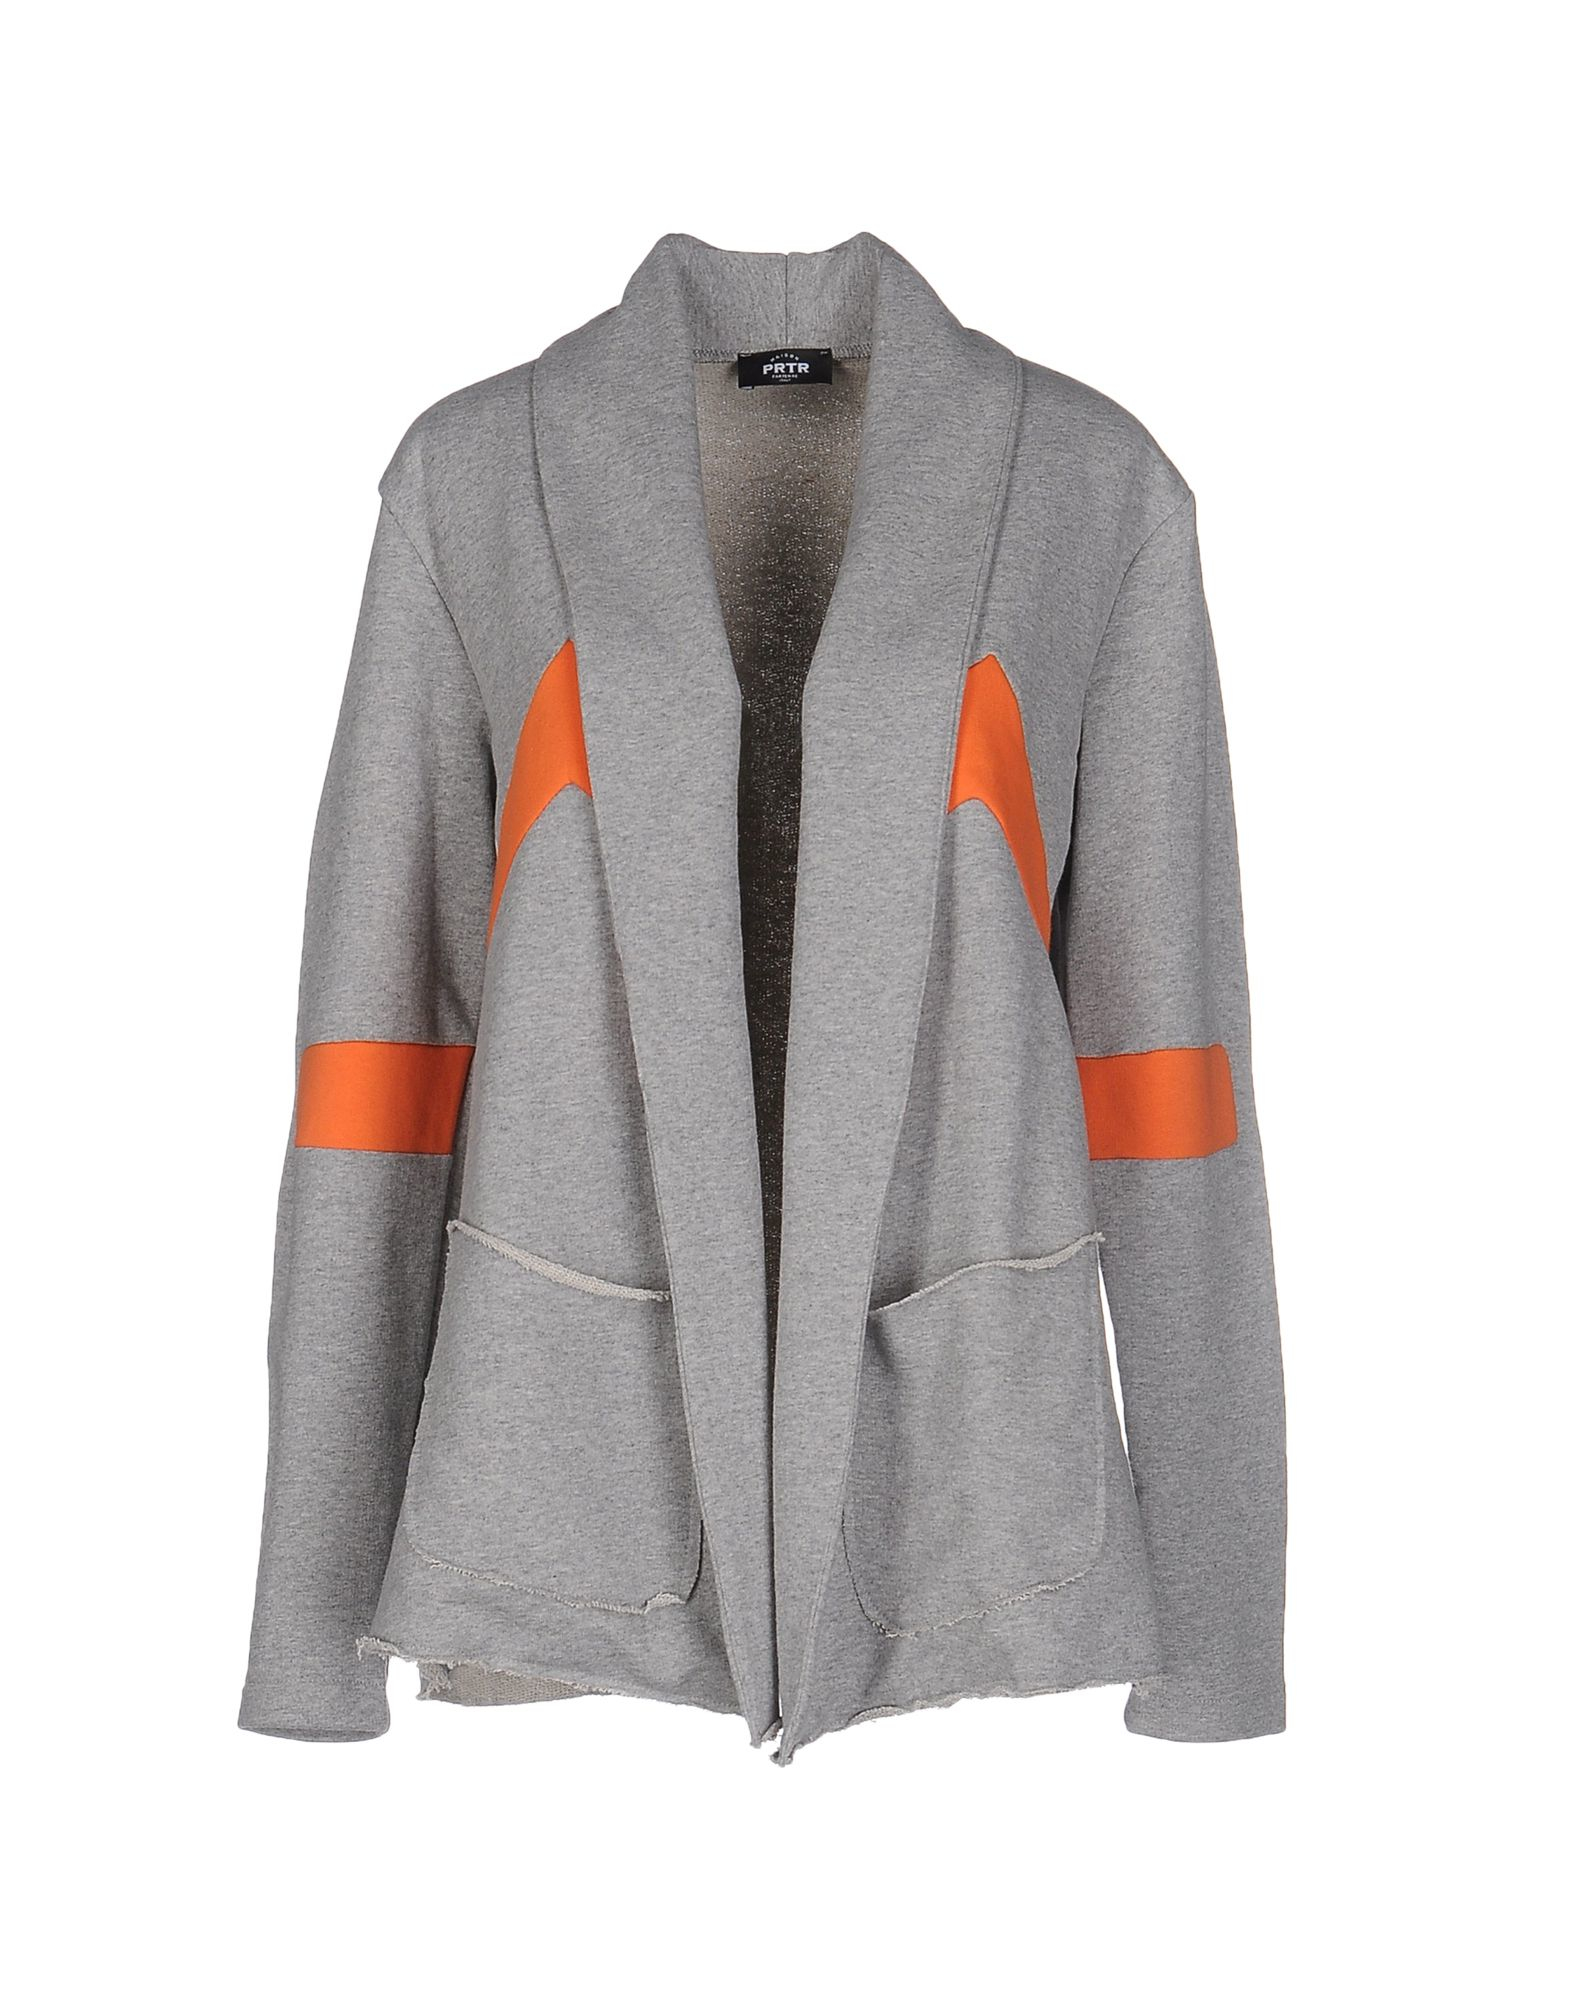 maison parterre sweatshirt in gray lyst. Black Bedroom Furniture Sets. Home Design Ideas